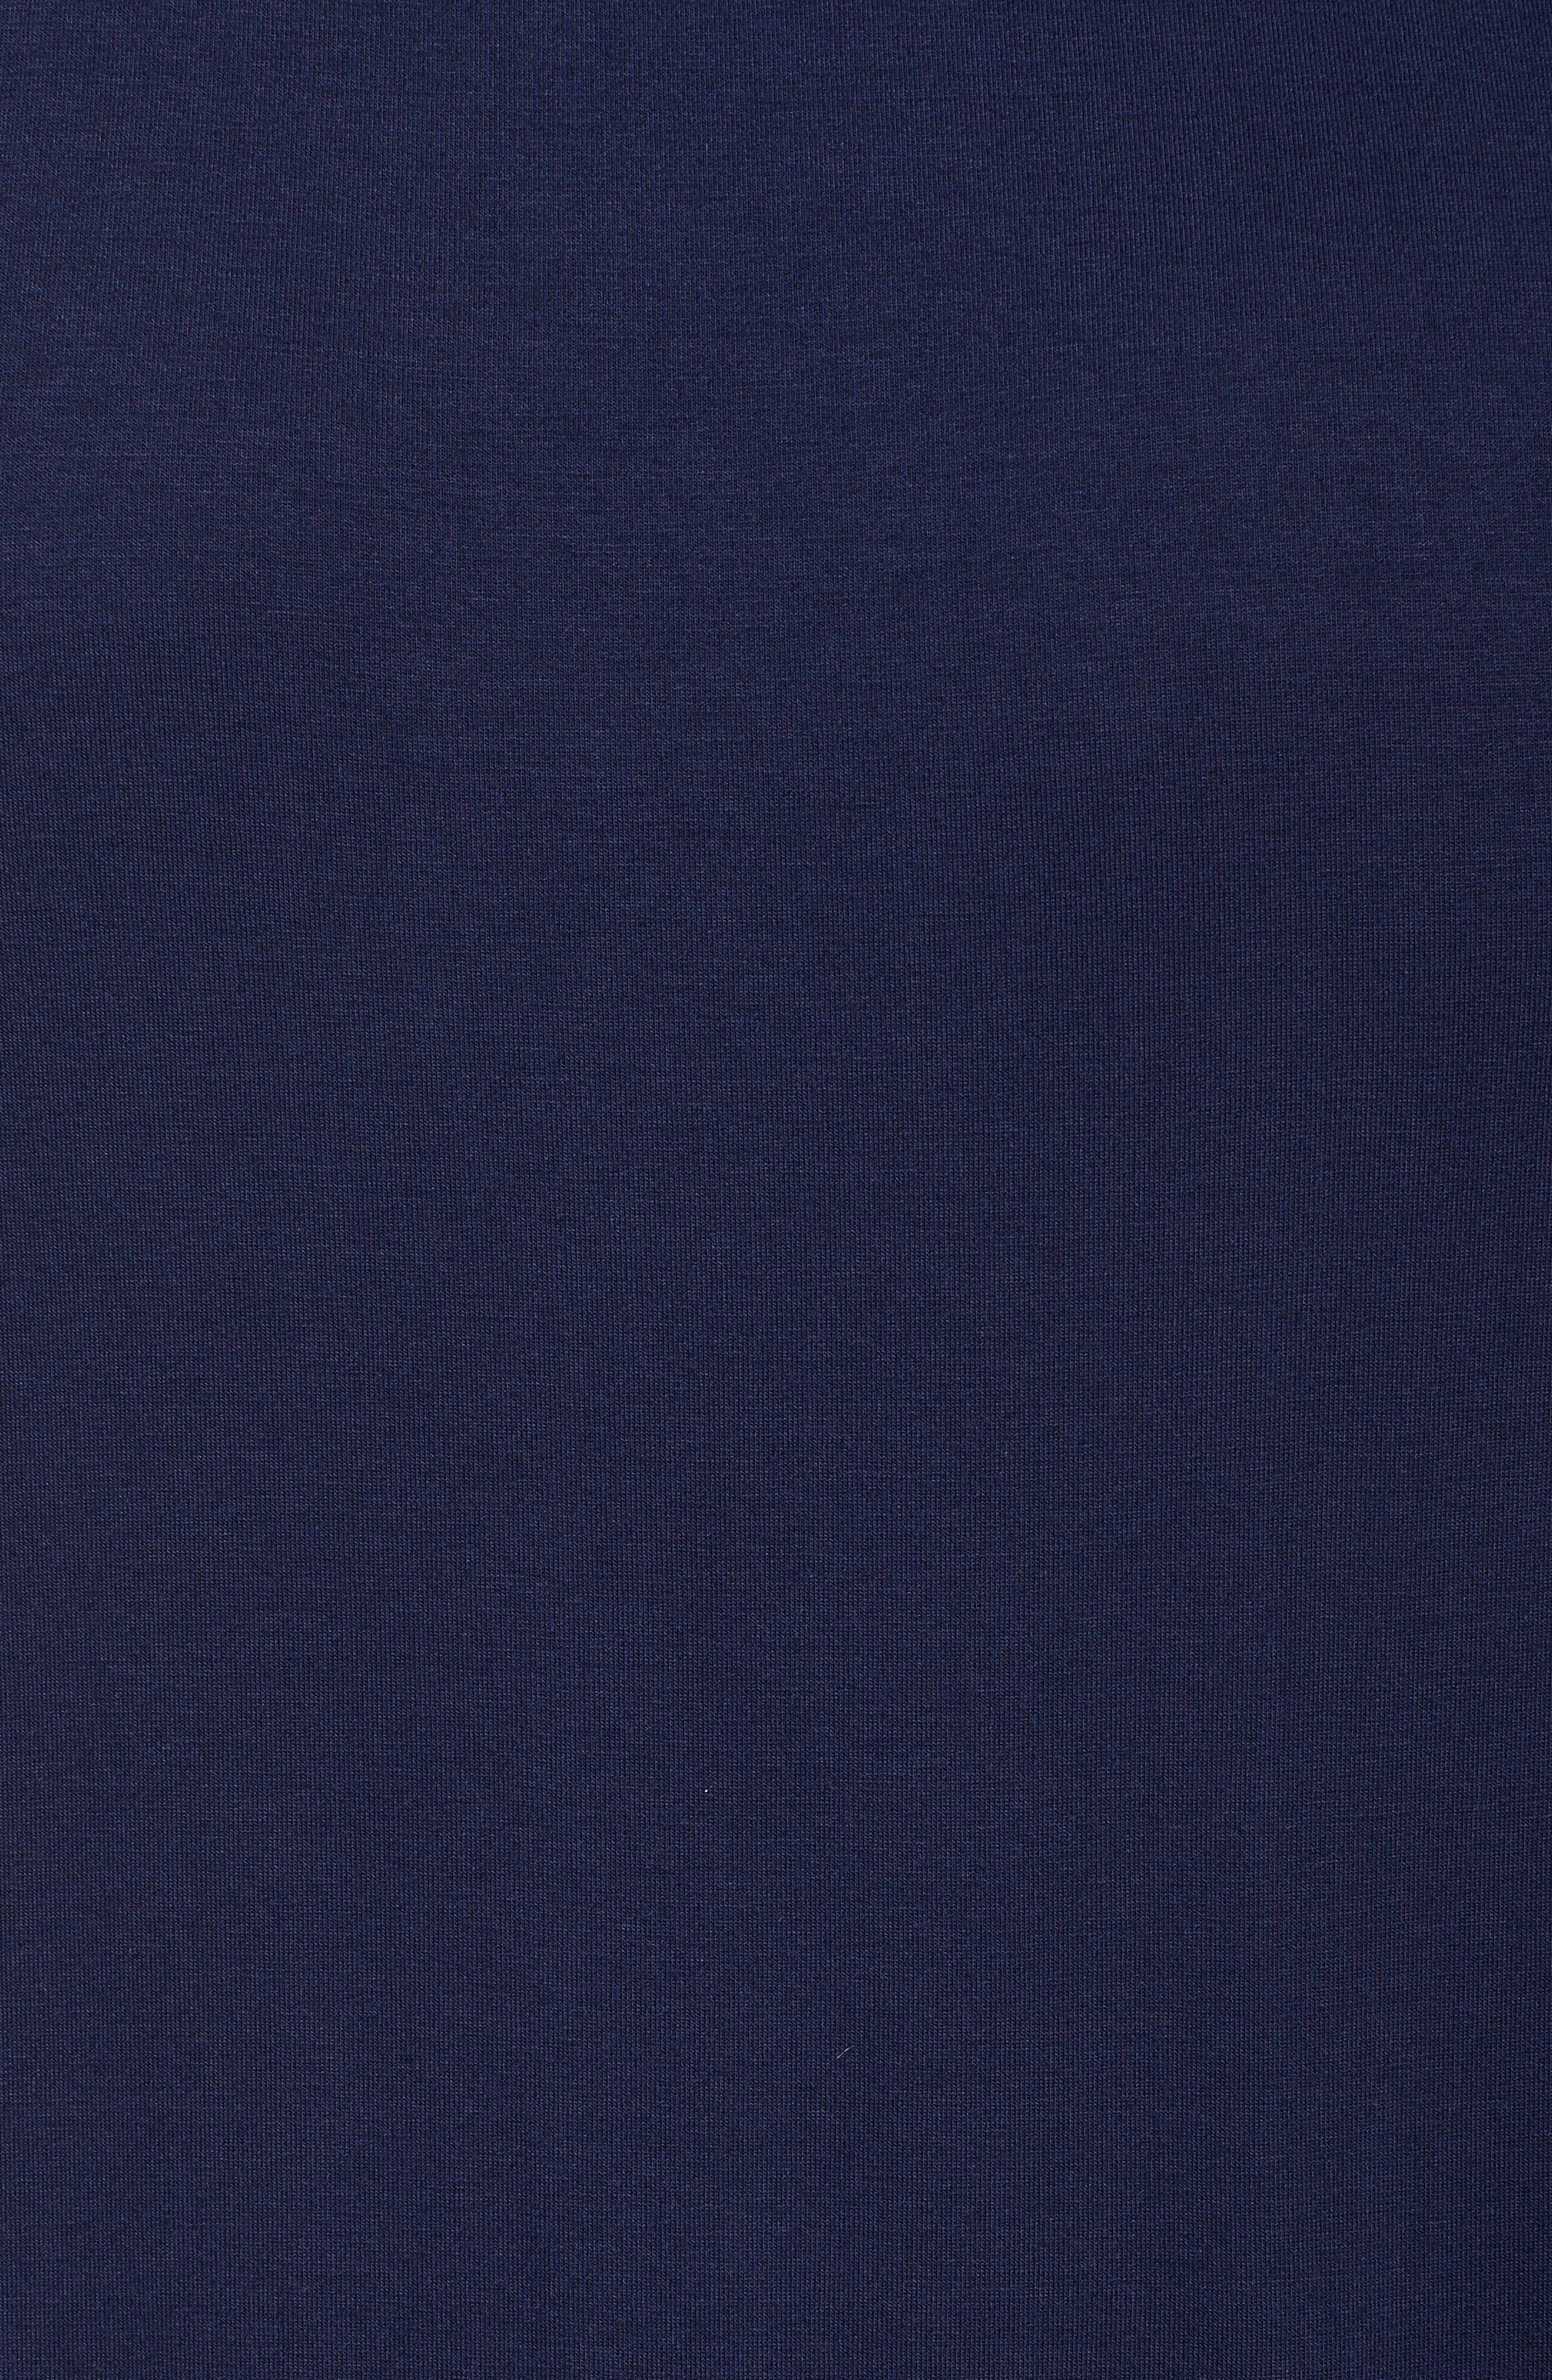 Knit Drawstring Waist Maxi Dress,                             Alternate thumbnail 6, color,                             NAVY PEACOAT